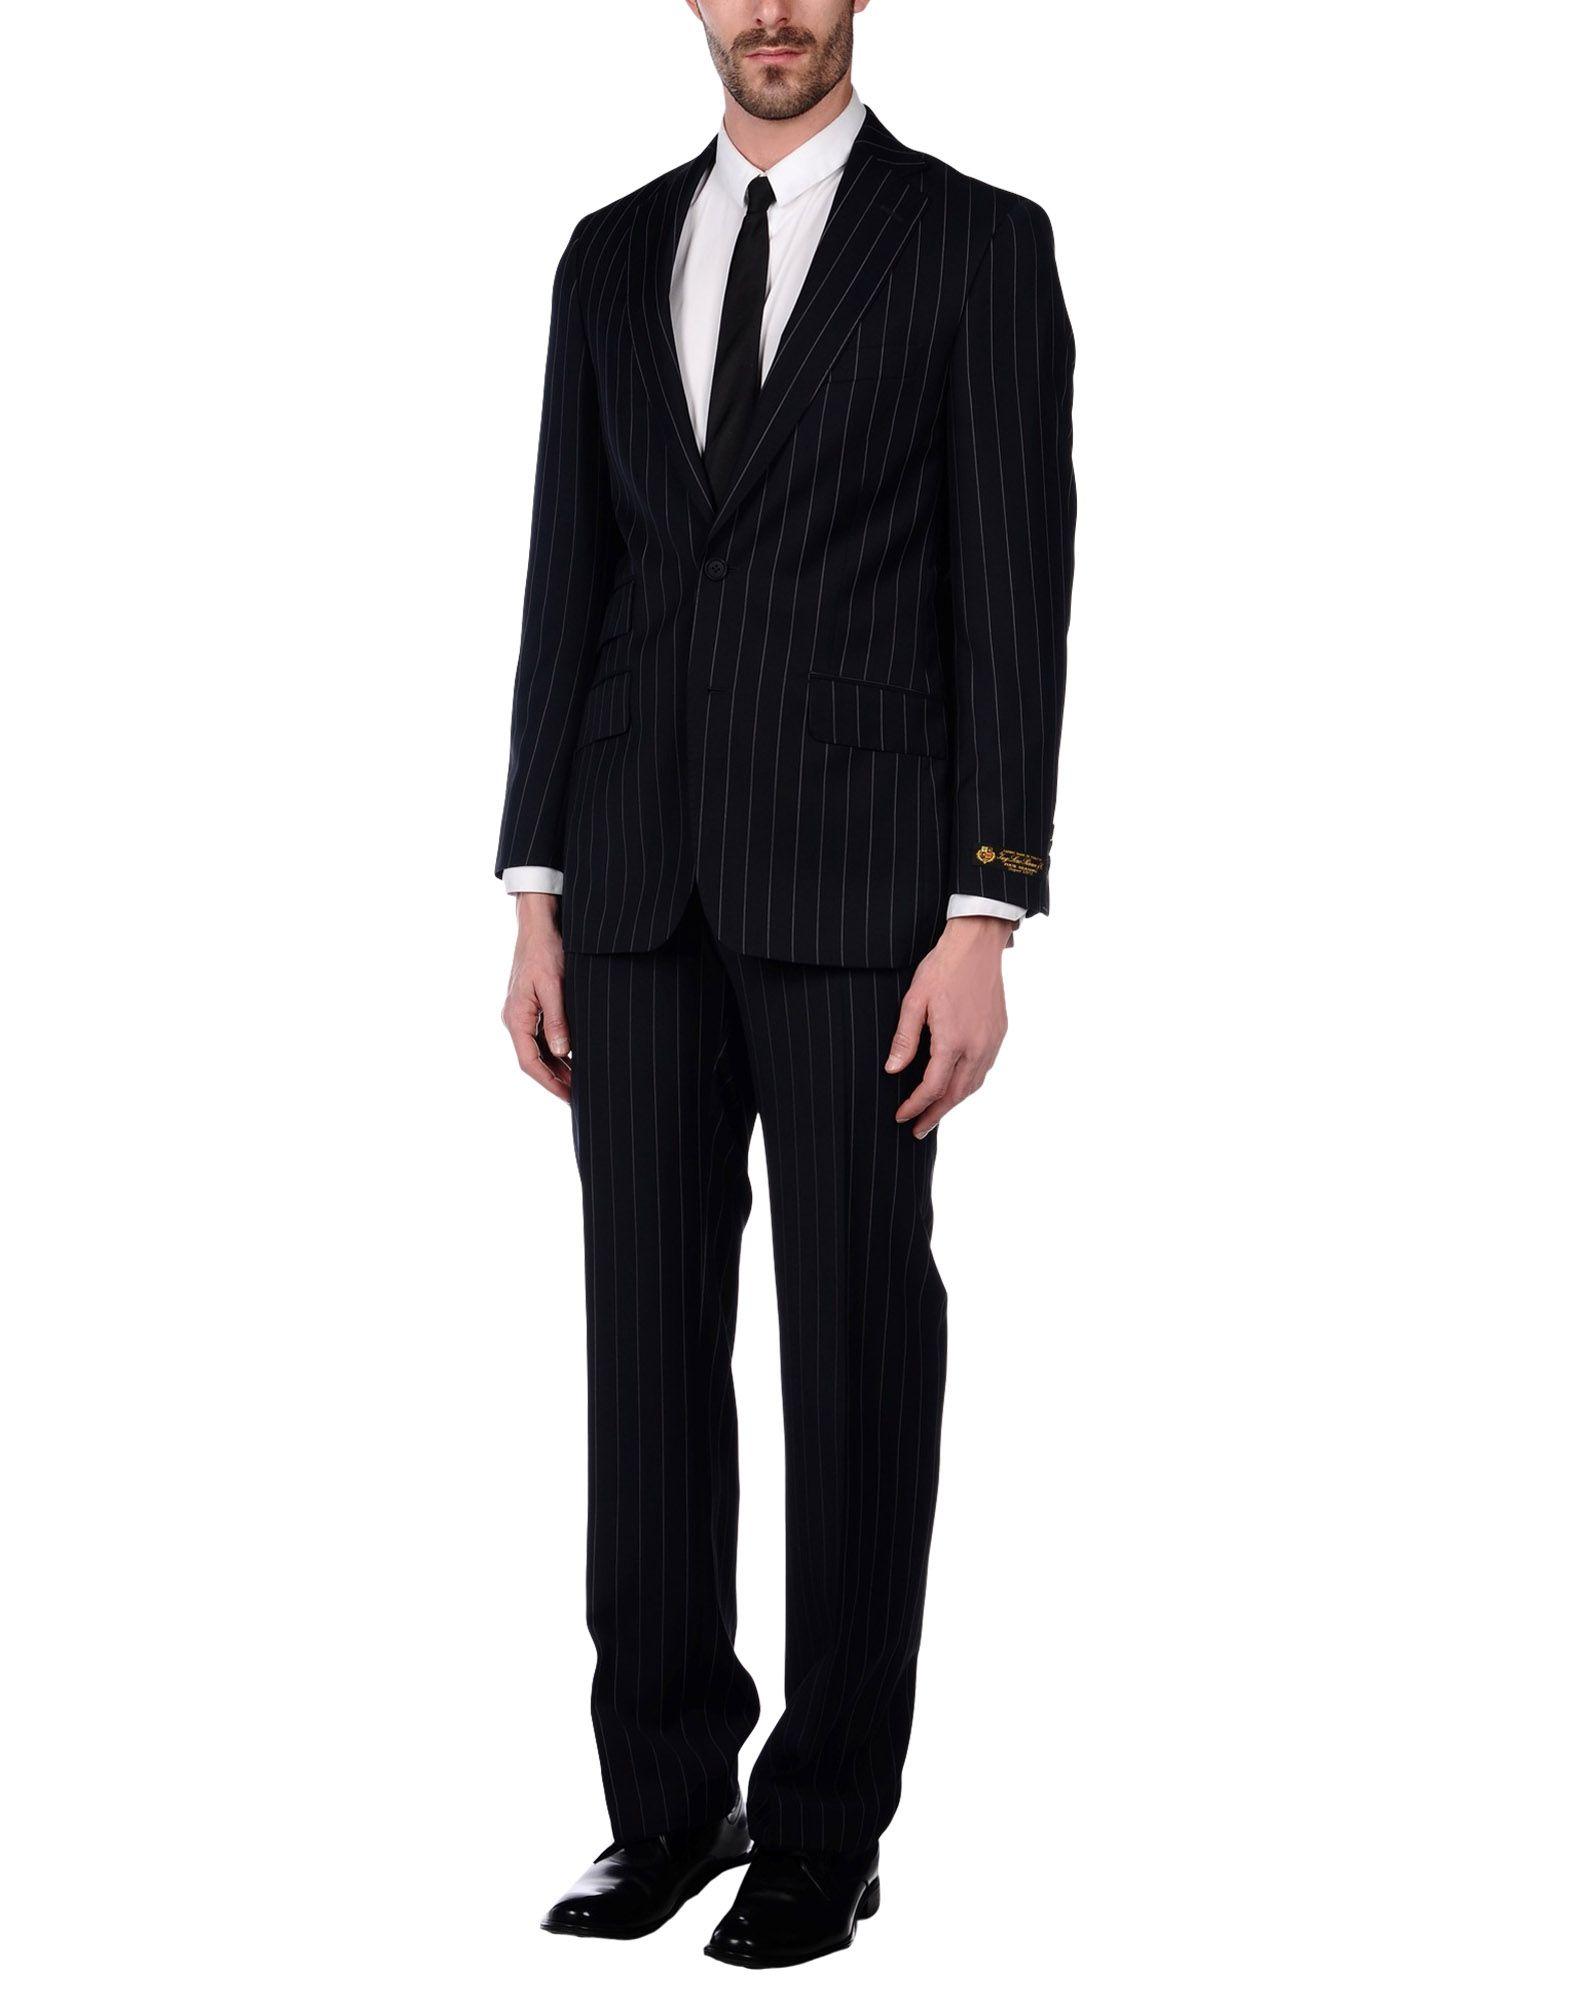 HENRY JERMYN メンズ スーツ ダークブルー 36 R ポリエステル 55% / ウール 45%